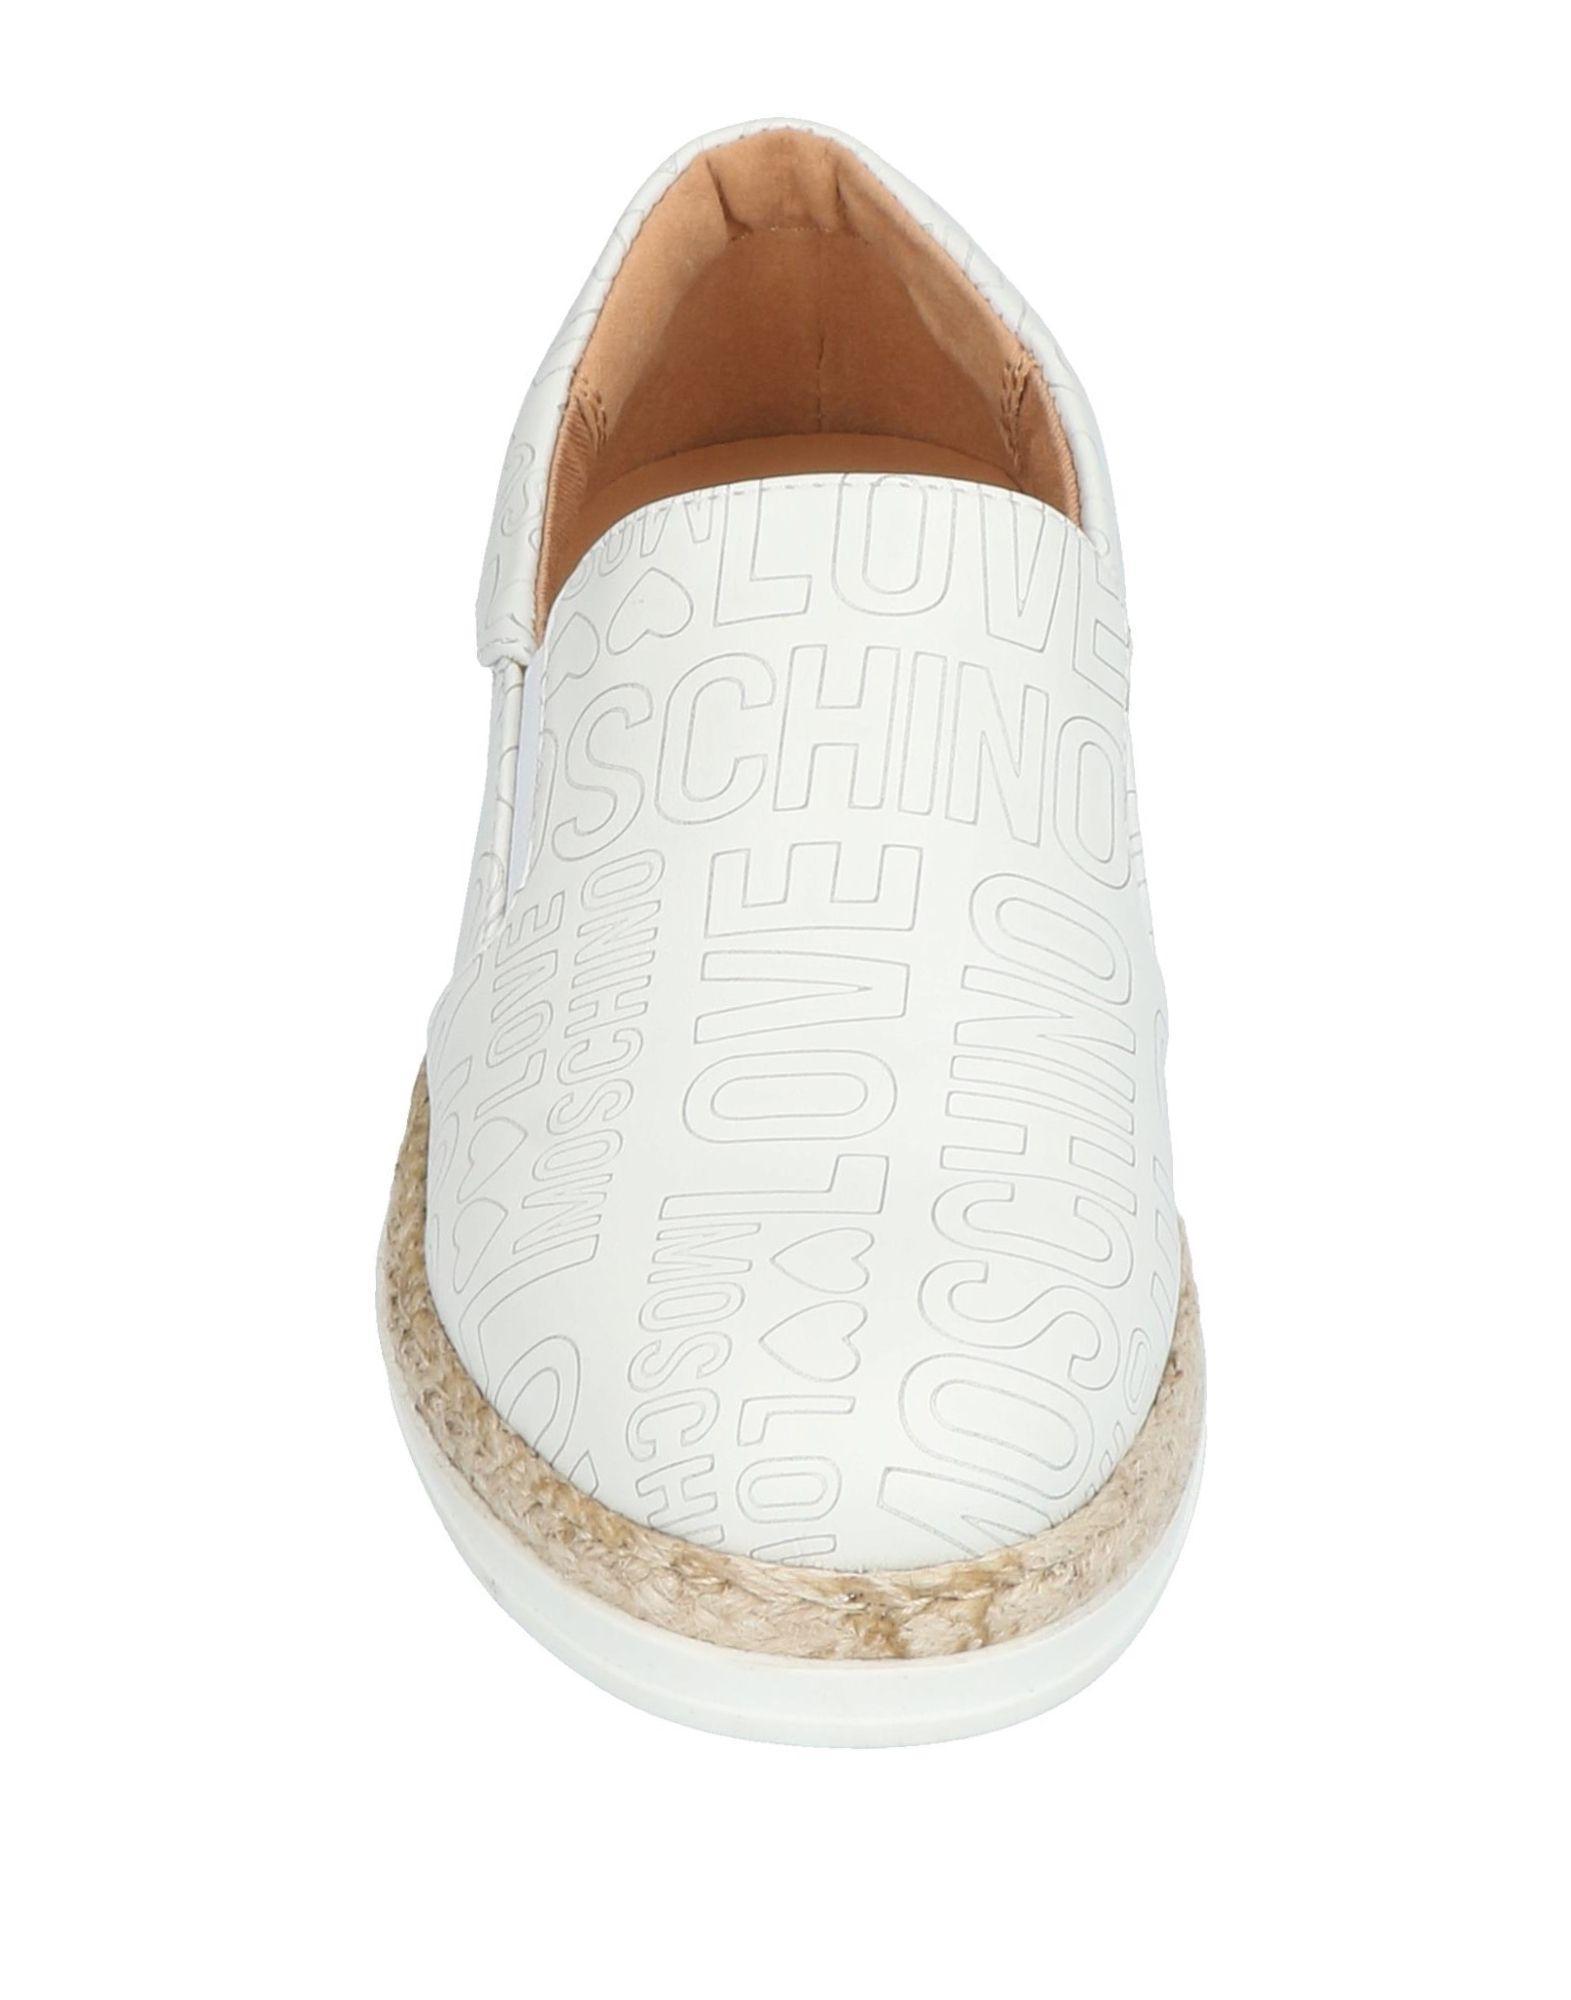 Sneakers & Tennis basses Love Moschino en coloris Blanc gFsq